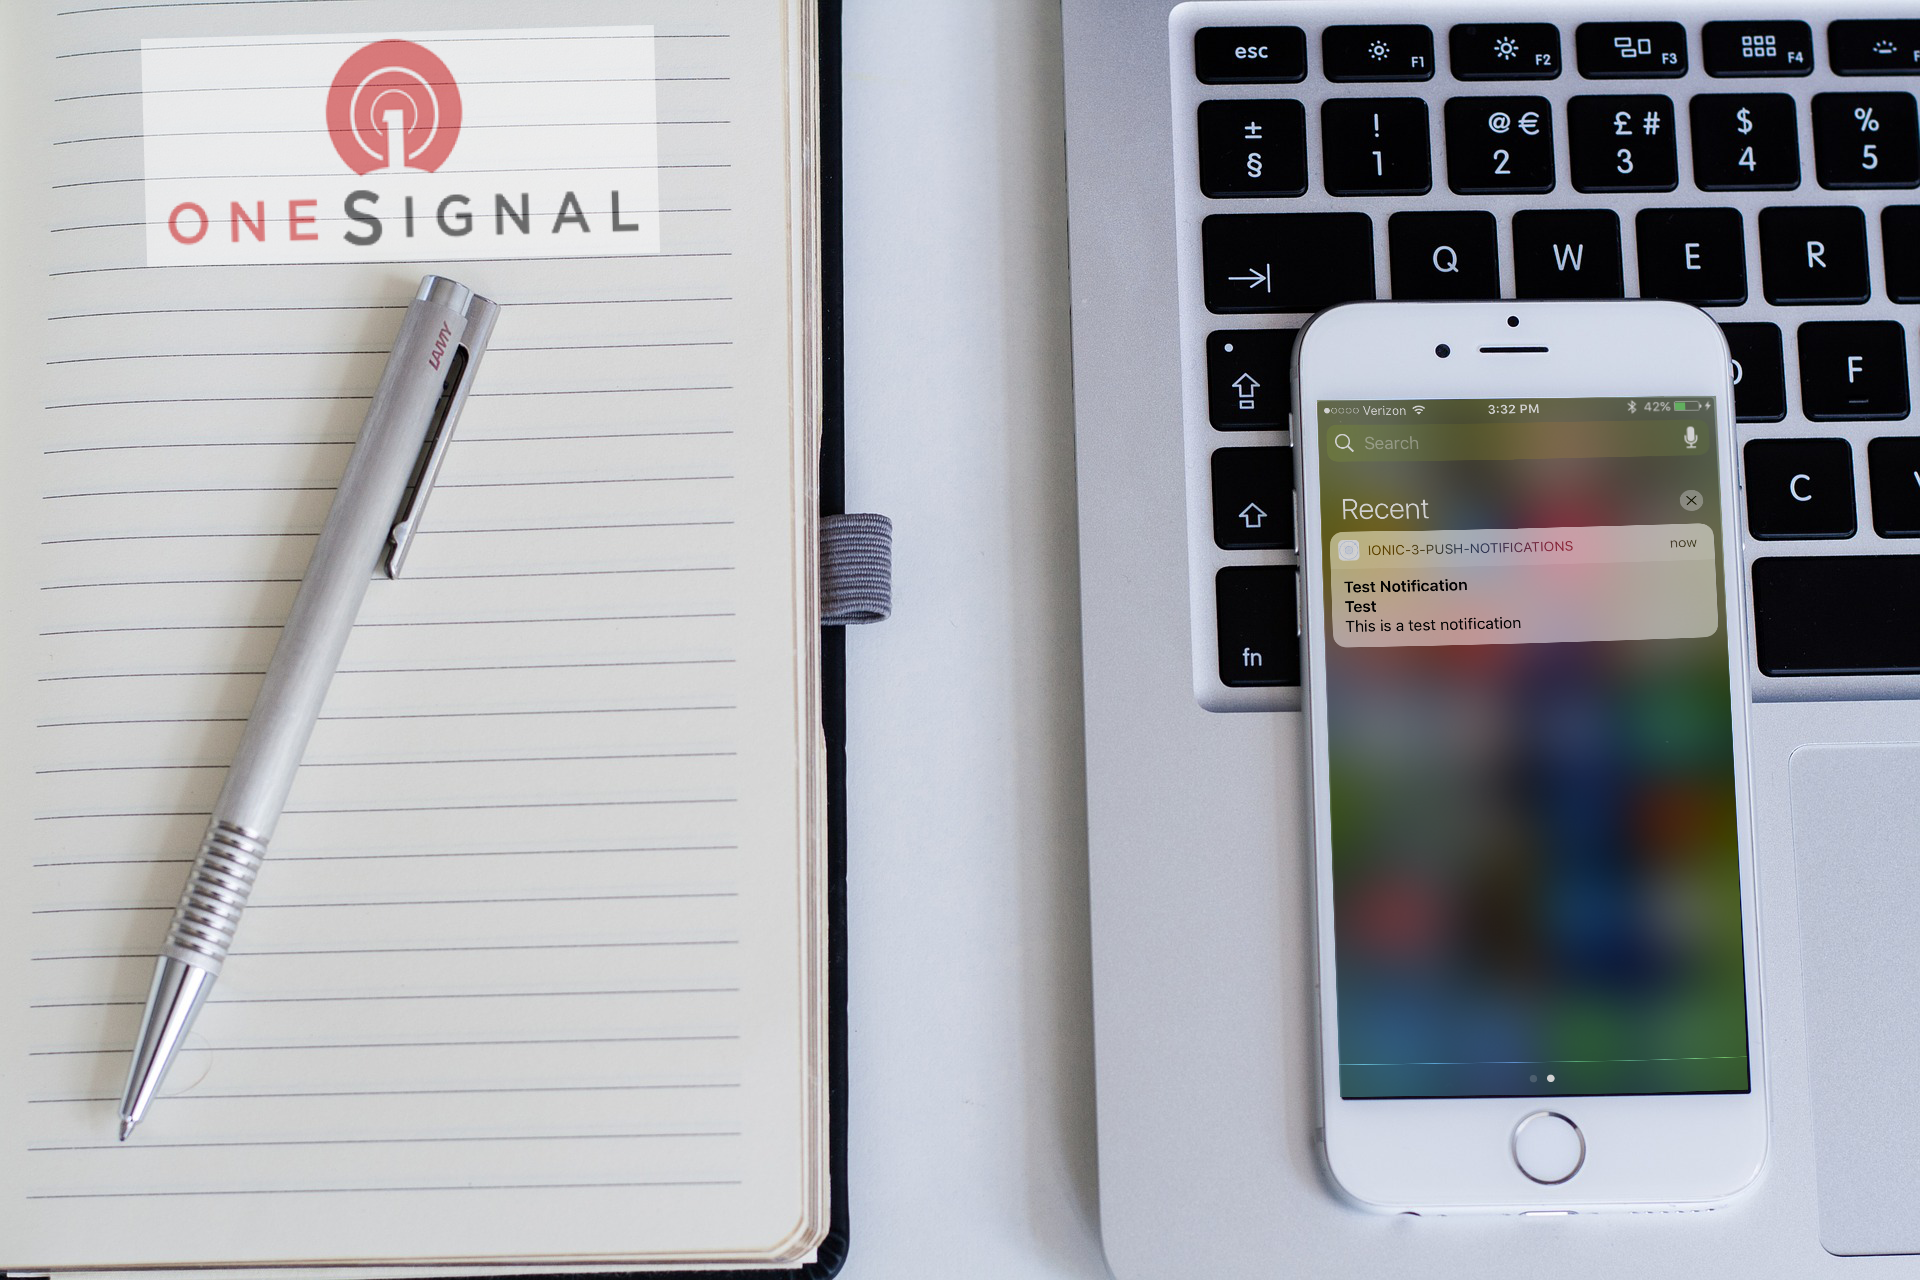 Ionic 3 Push Notifications One Signal - Ghadeer Rahhal's Blog